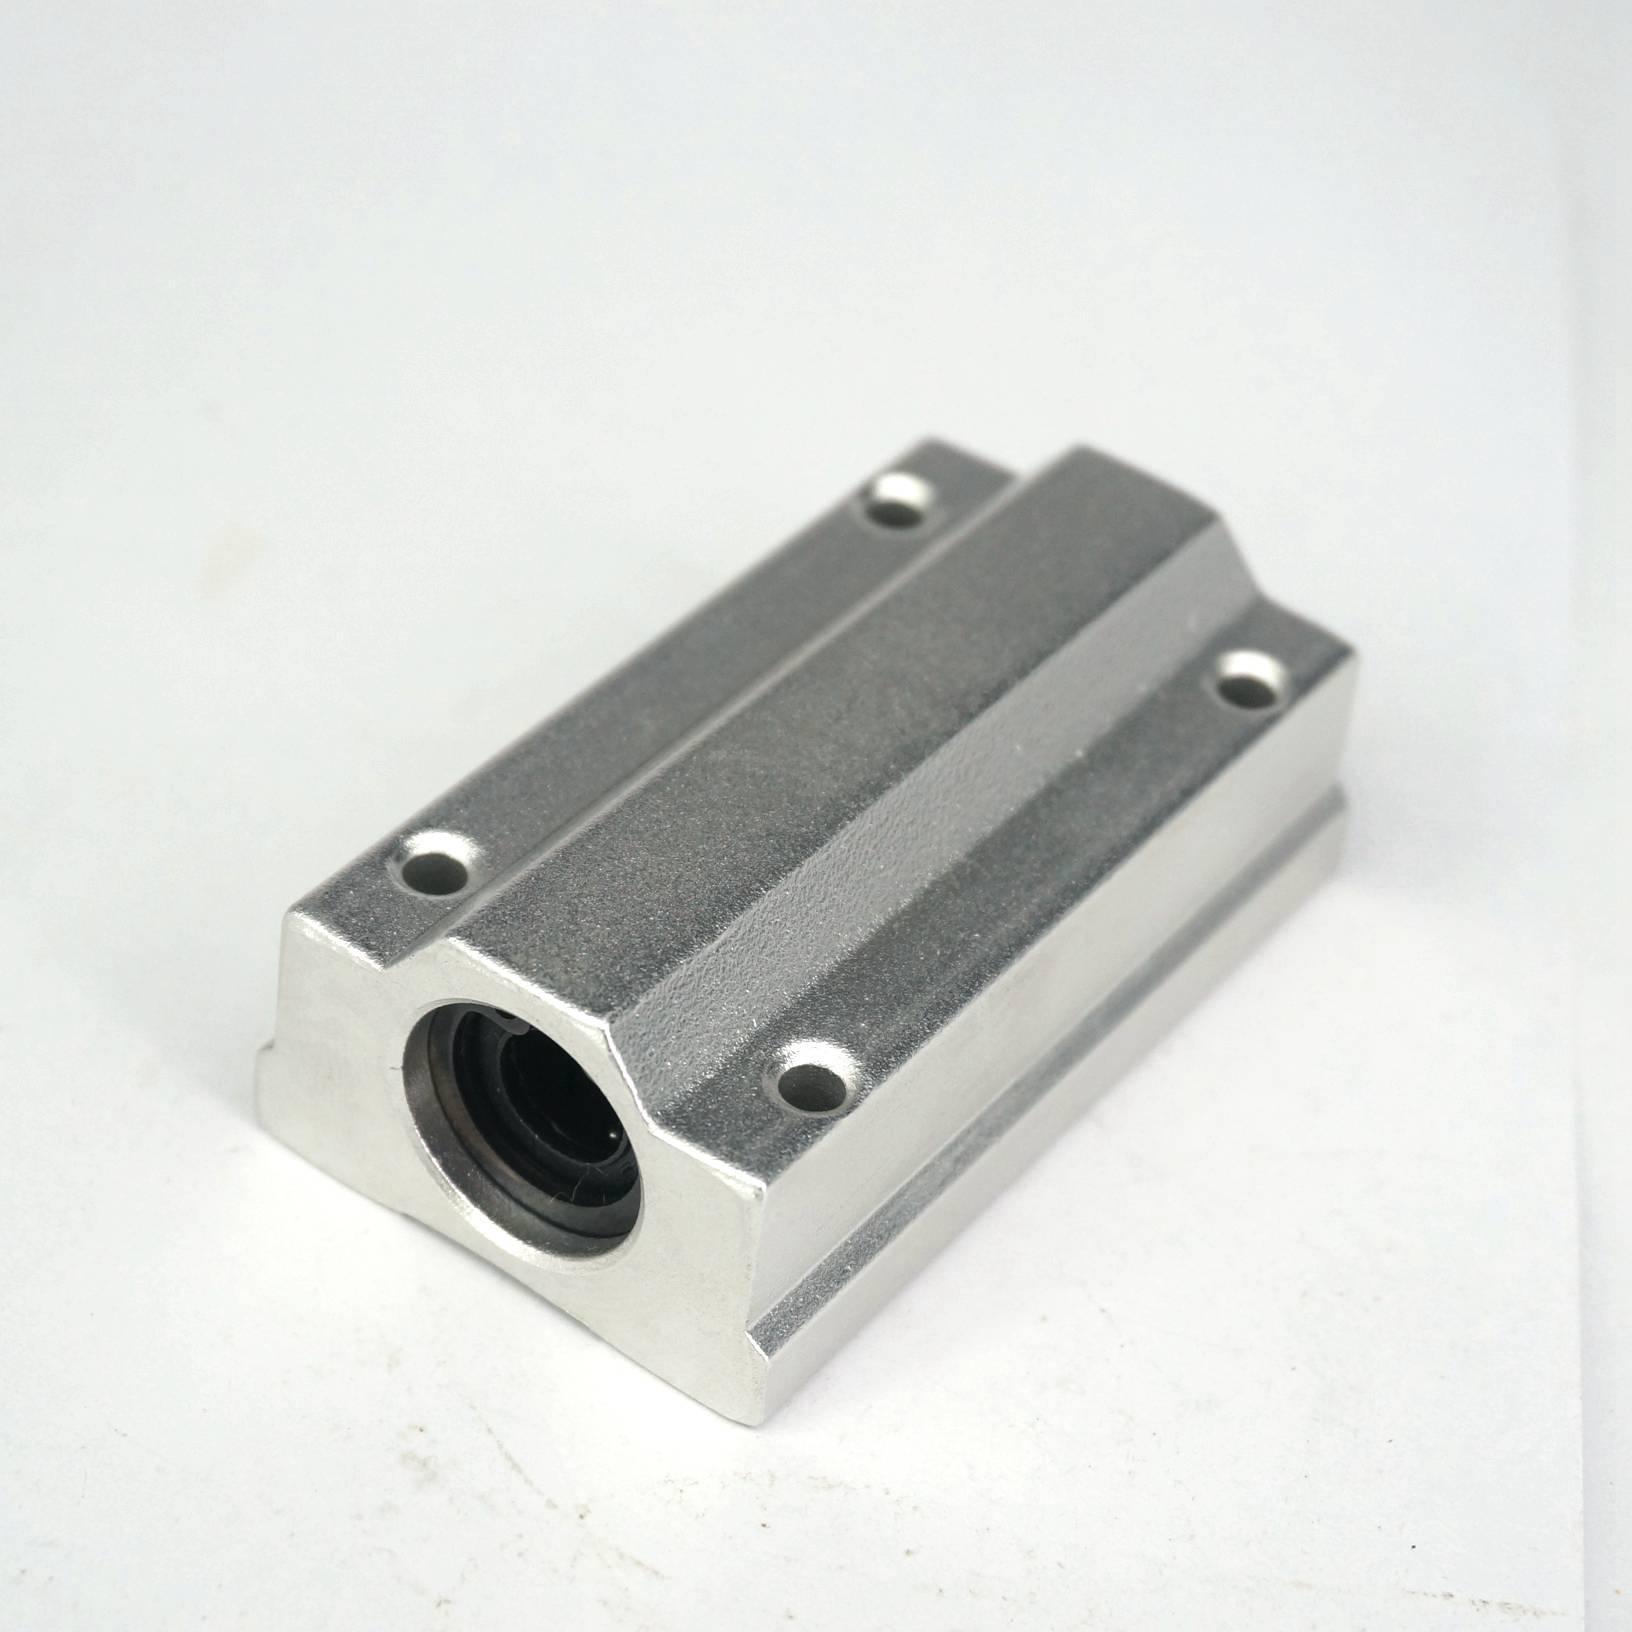 1Pcs SCS13LUU 13mm Aluminum Long Rail Linear Motion Ball Bearing Slide Bushing